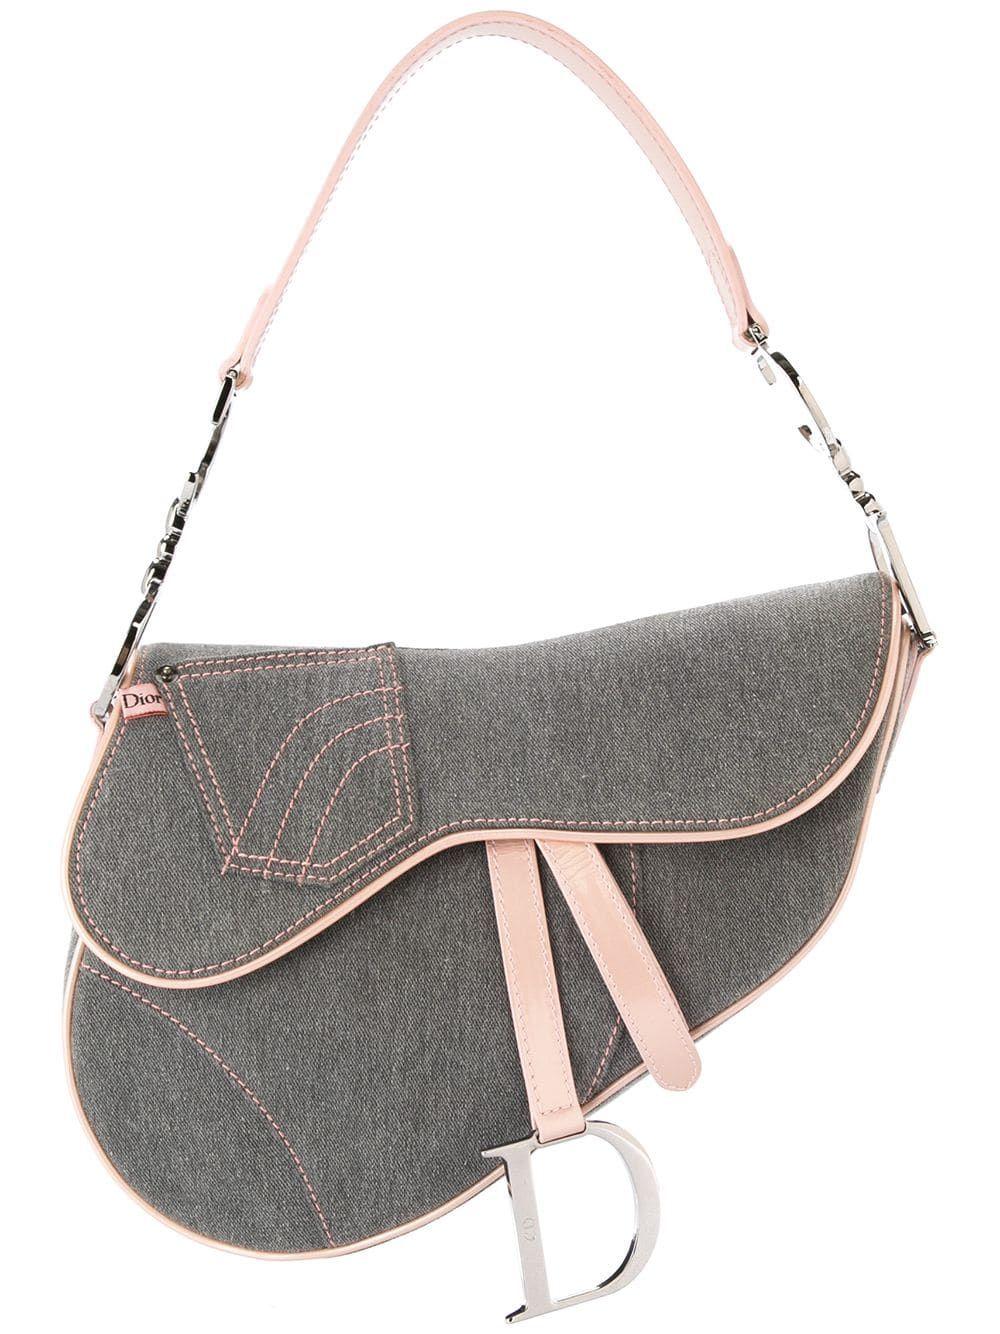 Christian Dior Pre Owned Denim Saddle Handbag Farfetch Saddle Handbags Vintage Dior Bag Dior Purses